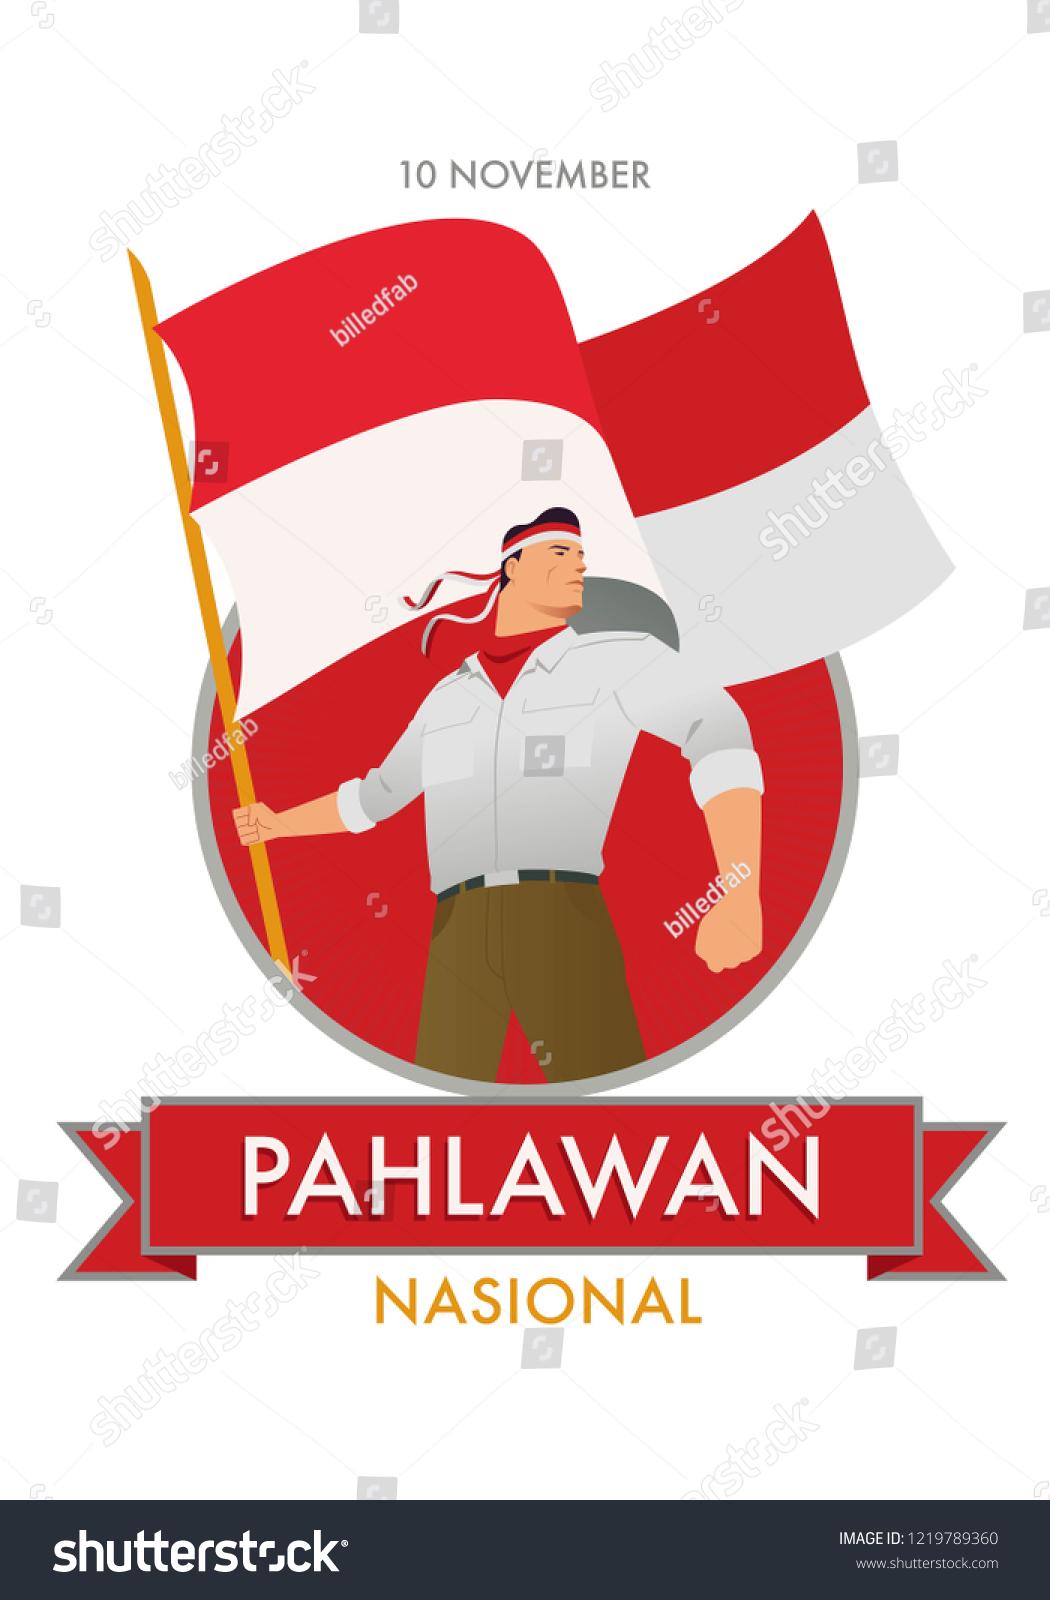 Pejuang Indonesia Vector : pejuang, indonesia, vector, Commemorating, Pahlawan, Nasional, Indonesian, National, Heroes, Stock, Vector, (Royalty, Free), 1219789360